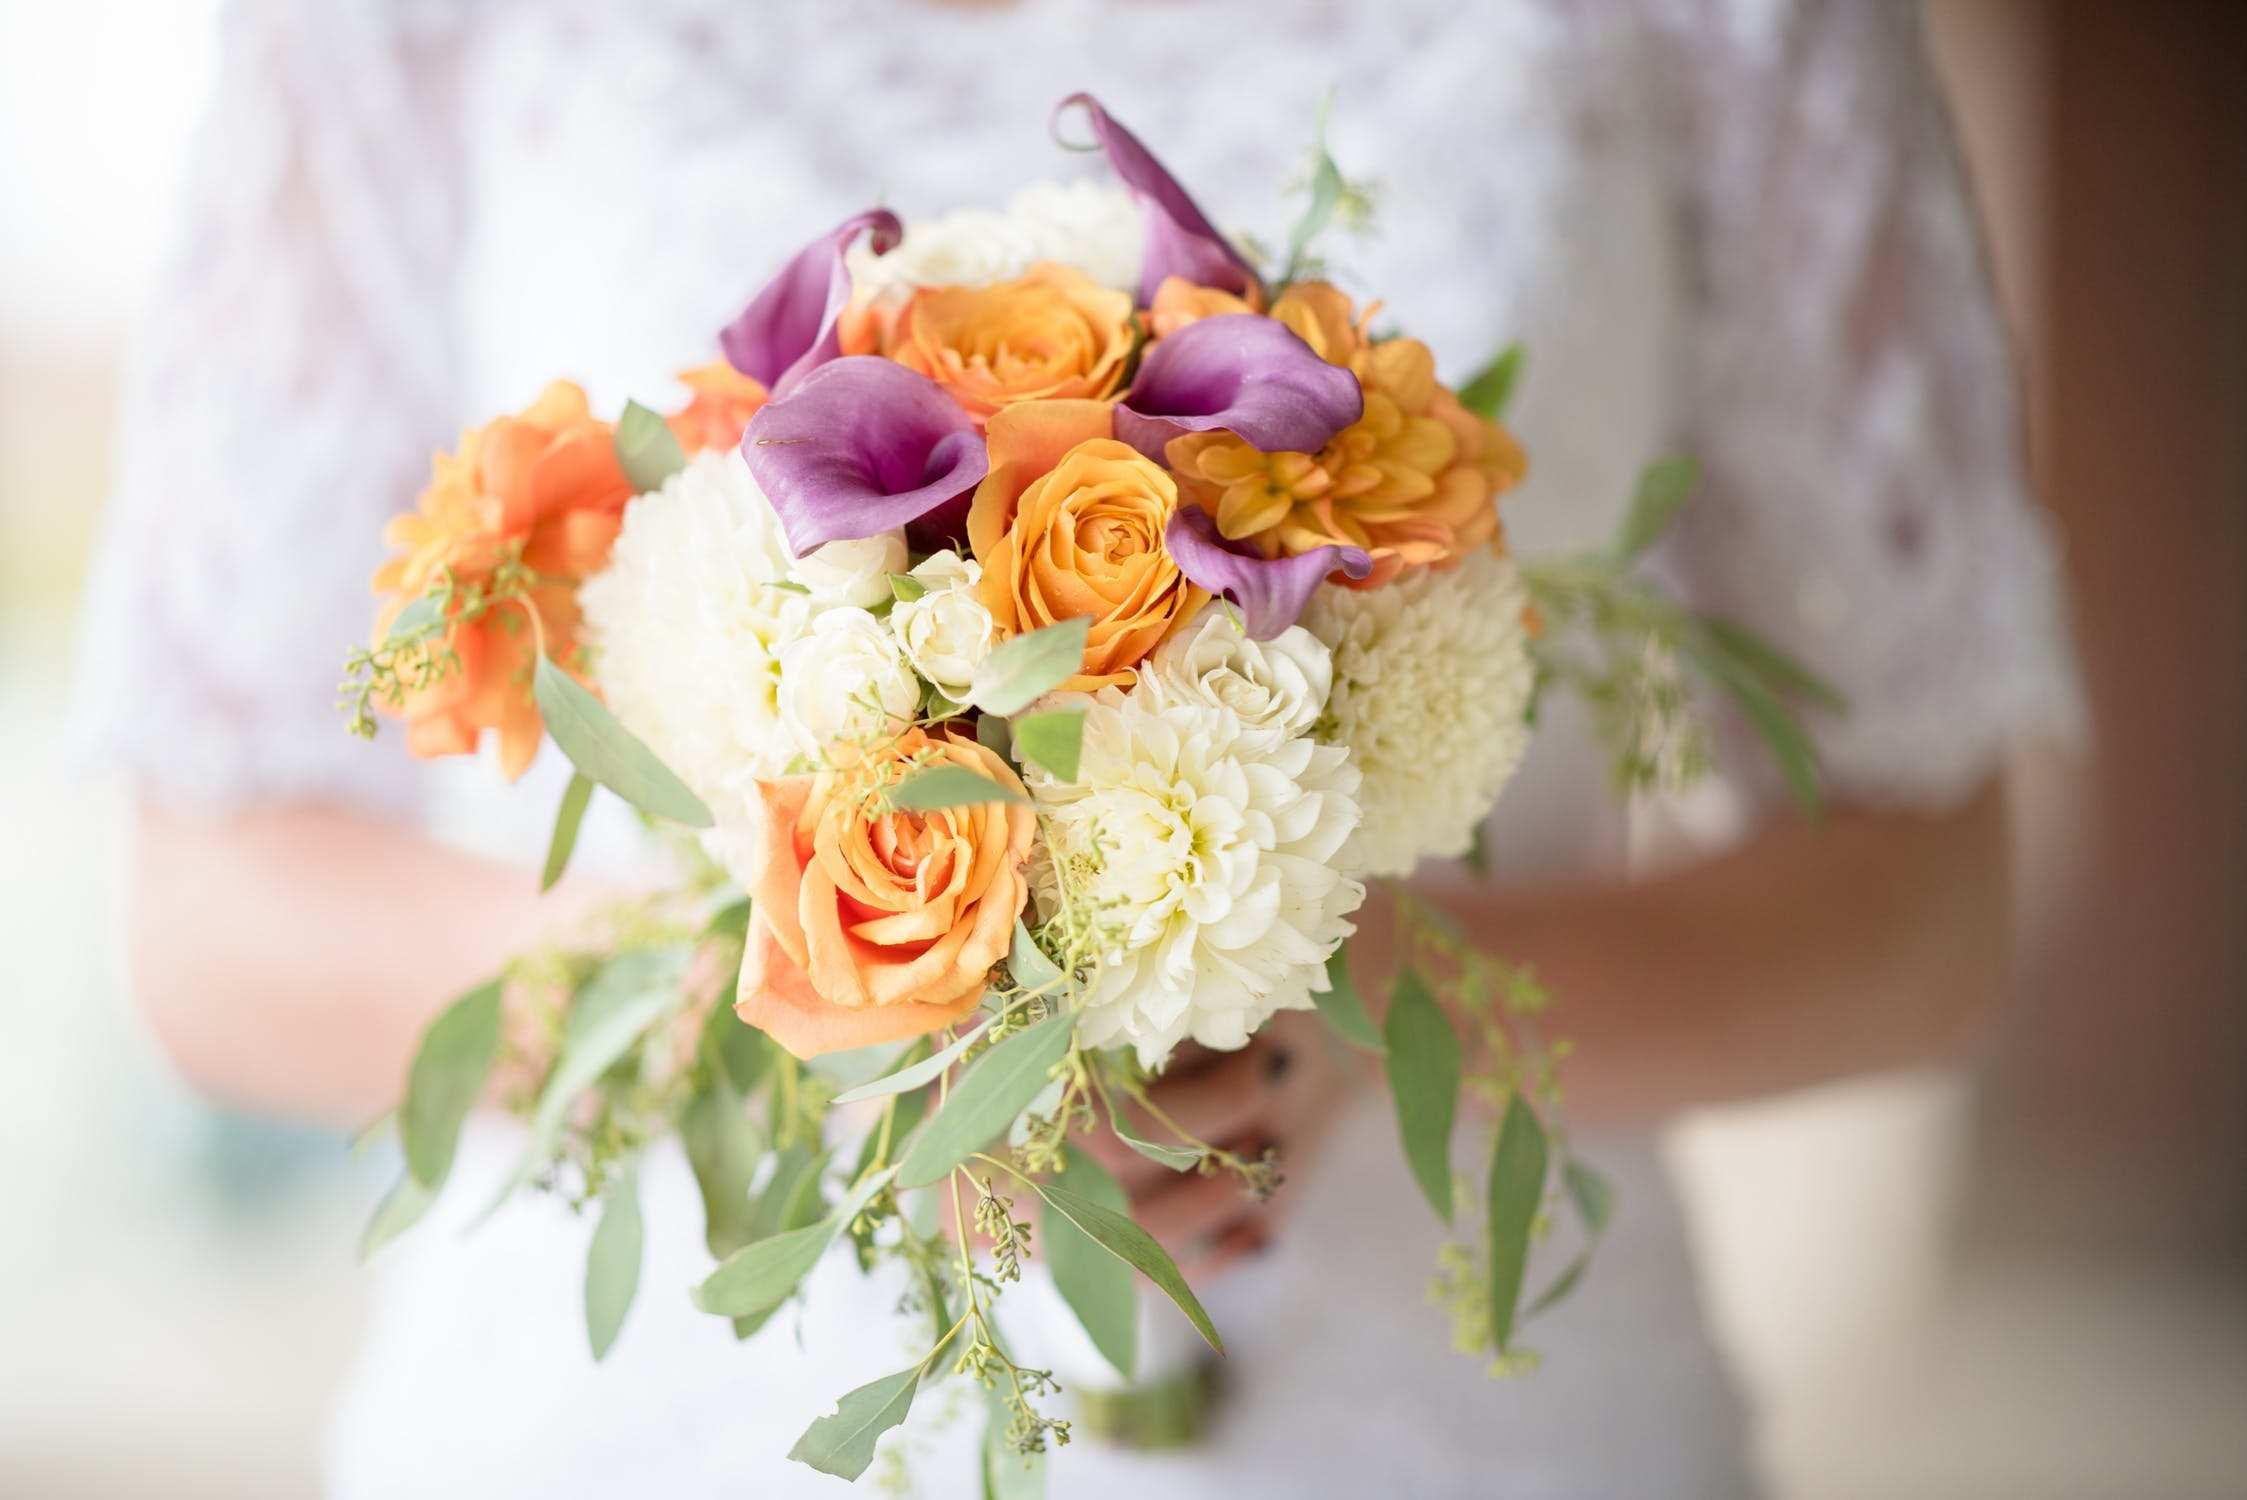 Thai Marriage Law